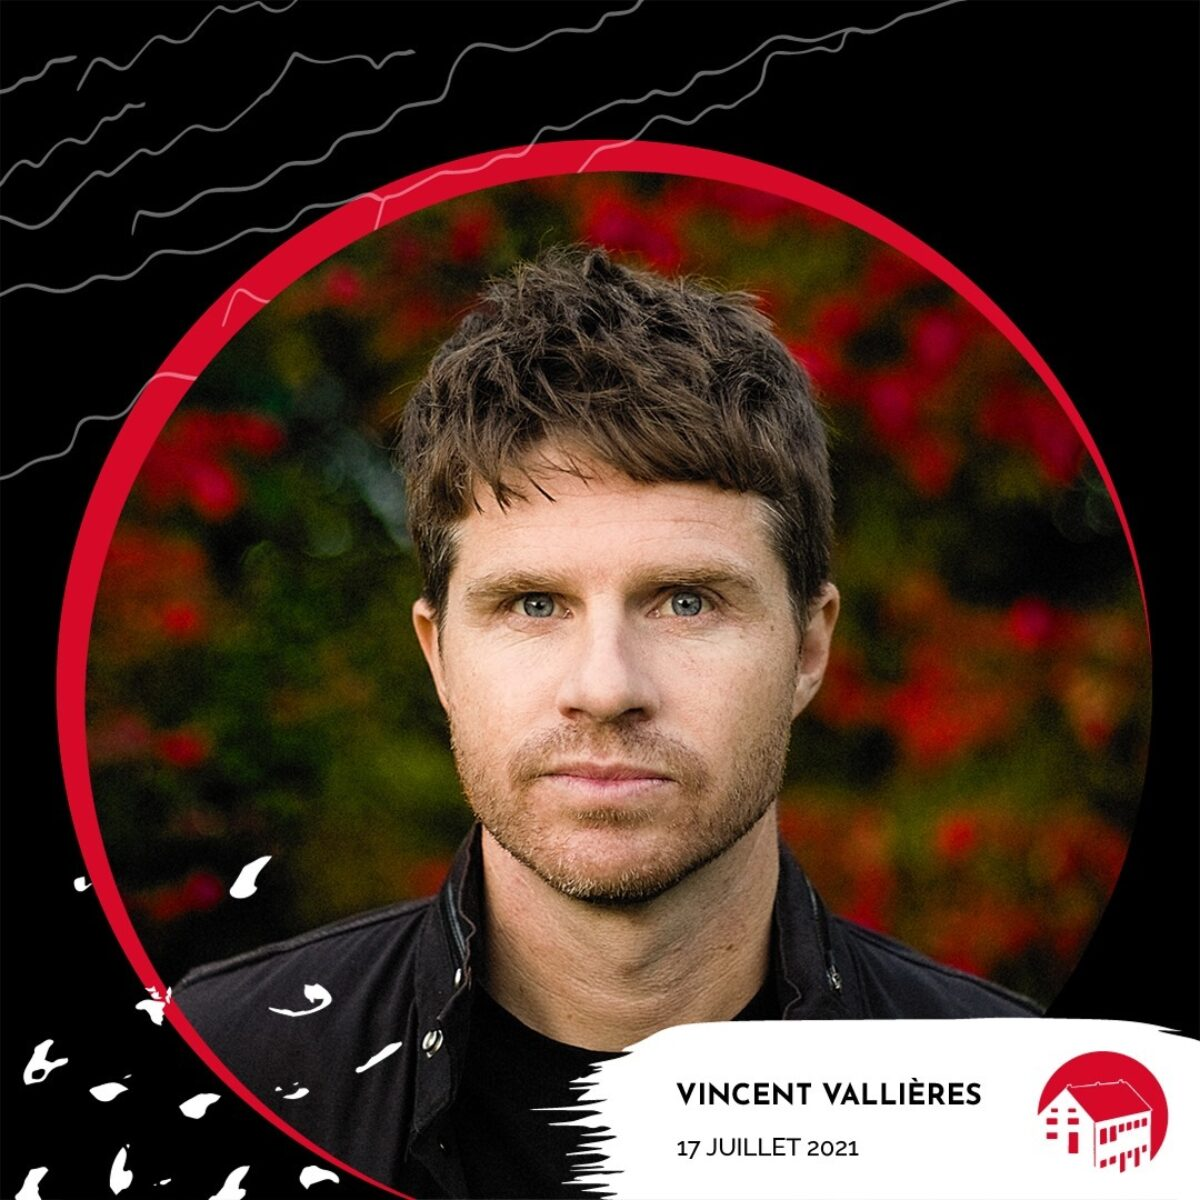 Vincent Vallieres